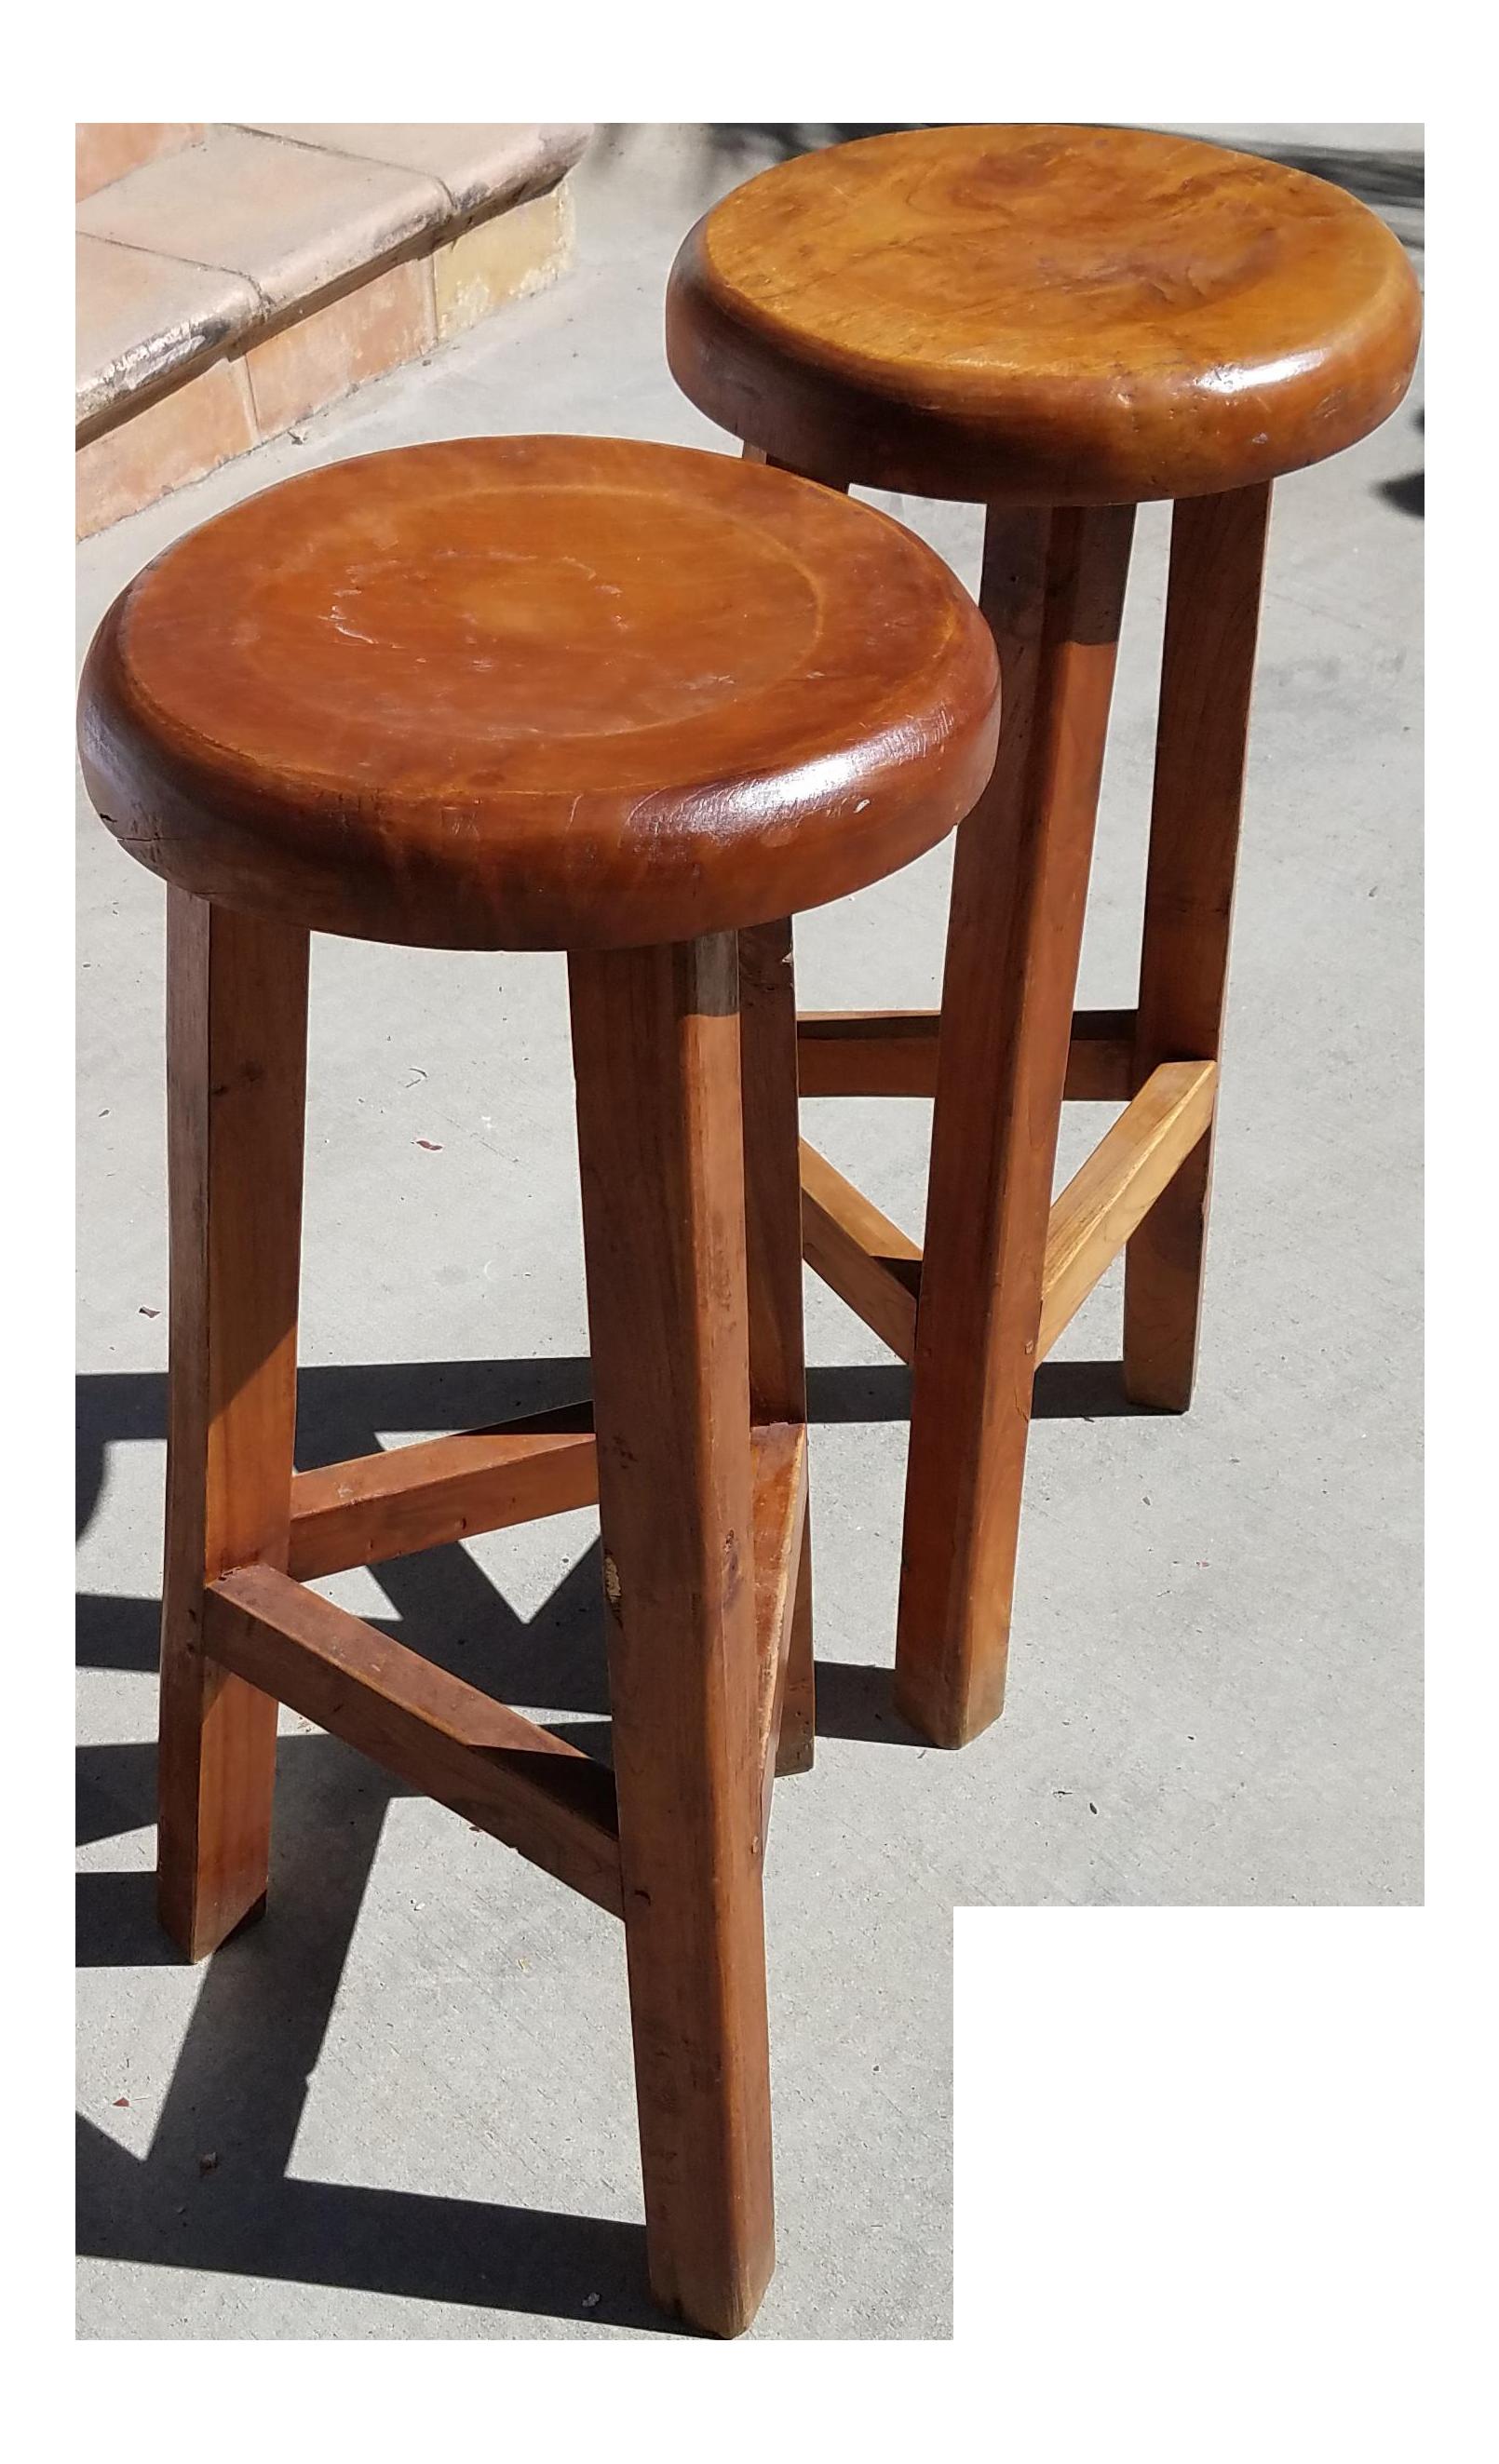 Rustic Solid Wood Barstools - A Pair  sc 1 st  Chairish & Vintage u0026 Used Bar Stools | Chairish islam-shia.org